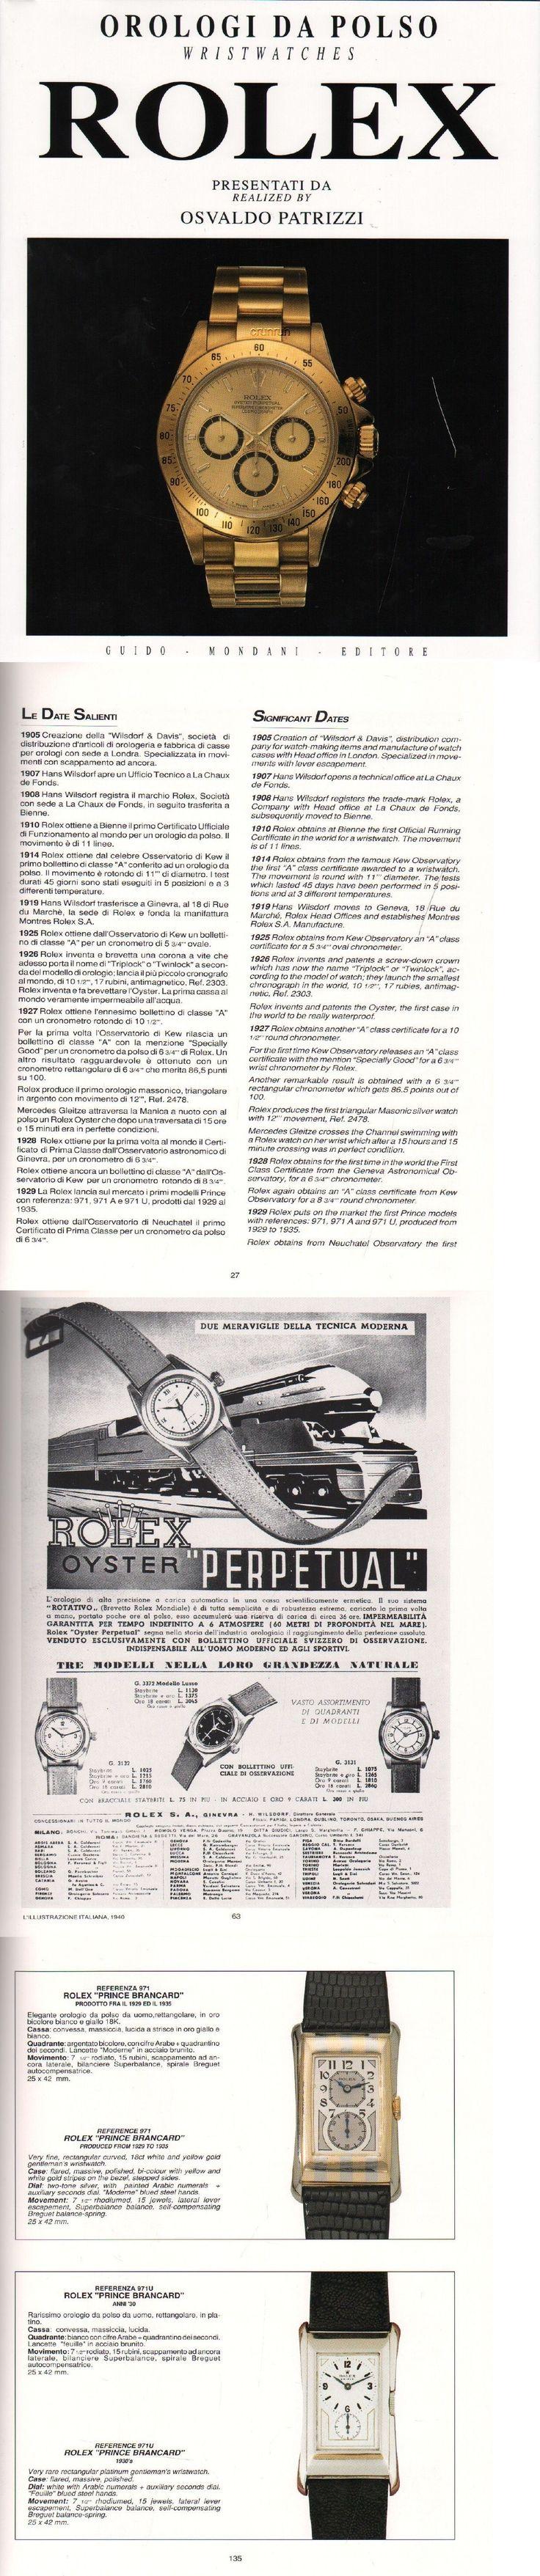 Manuals and Guides 93720: Rolex Wristwatch Book, Osvaldo Patrizzi, Guido Mondani Editor, Orologi Da Polso BUY IT NOW ONLY: $50.0